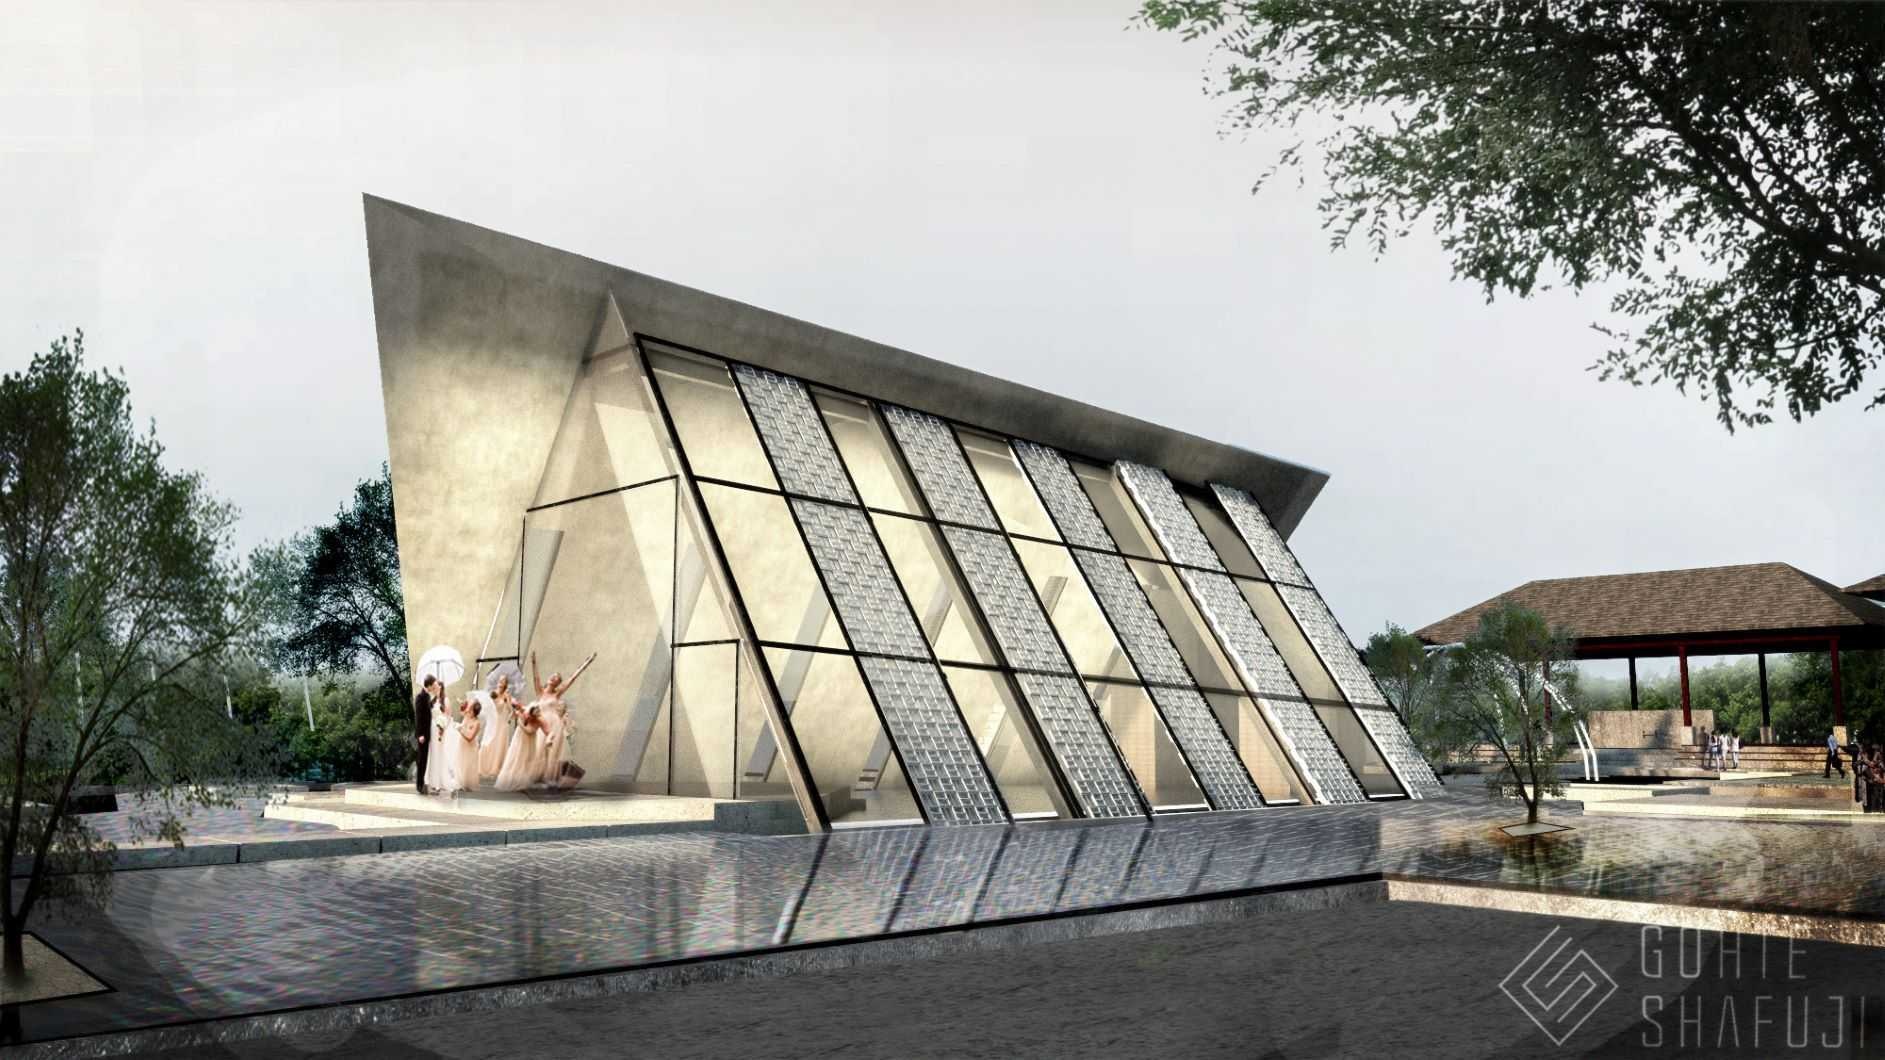 Gohte Architects Allinson Puncak Resort Cisarua, Kec. Cisarua, Kabupaten Bandung Barat, Jawa Barat, Indonesia Cisarua, Kec. Cisarua, Kabupaten Bandung Barat, Jawa Barat, Indonesia Gohte-Architects-Allinson-Puncak-Resort   96672